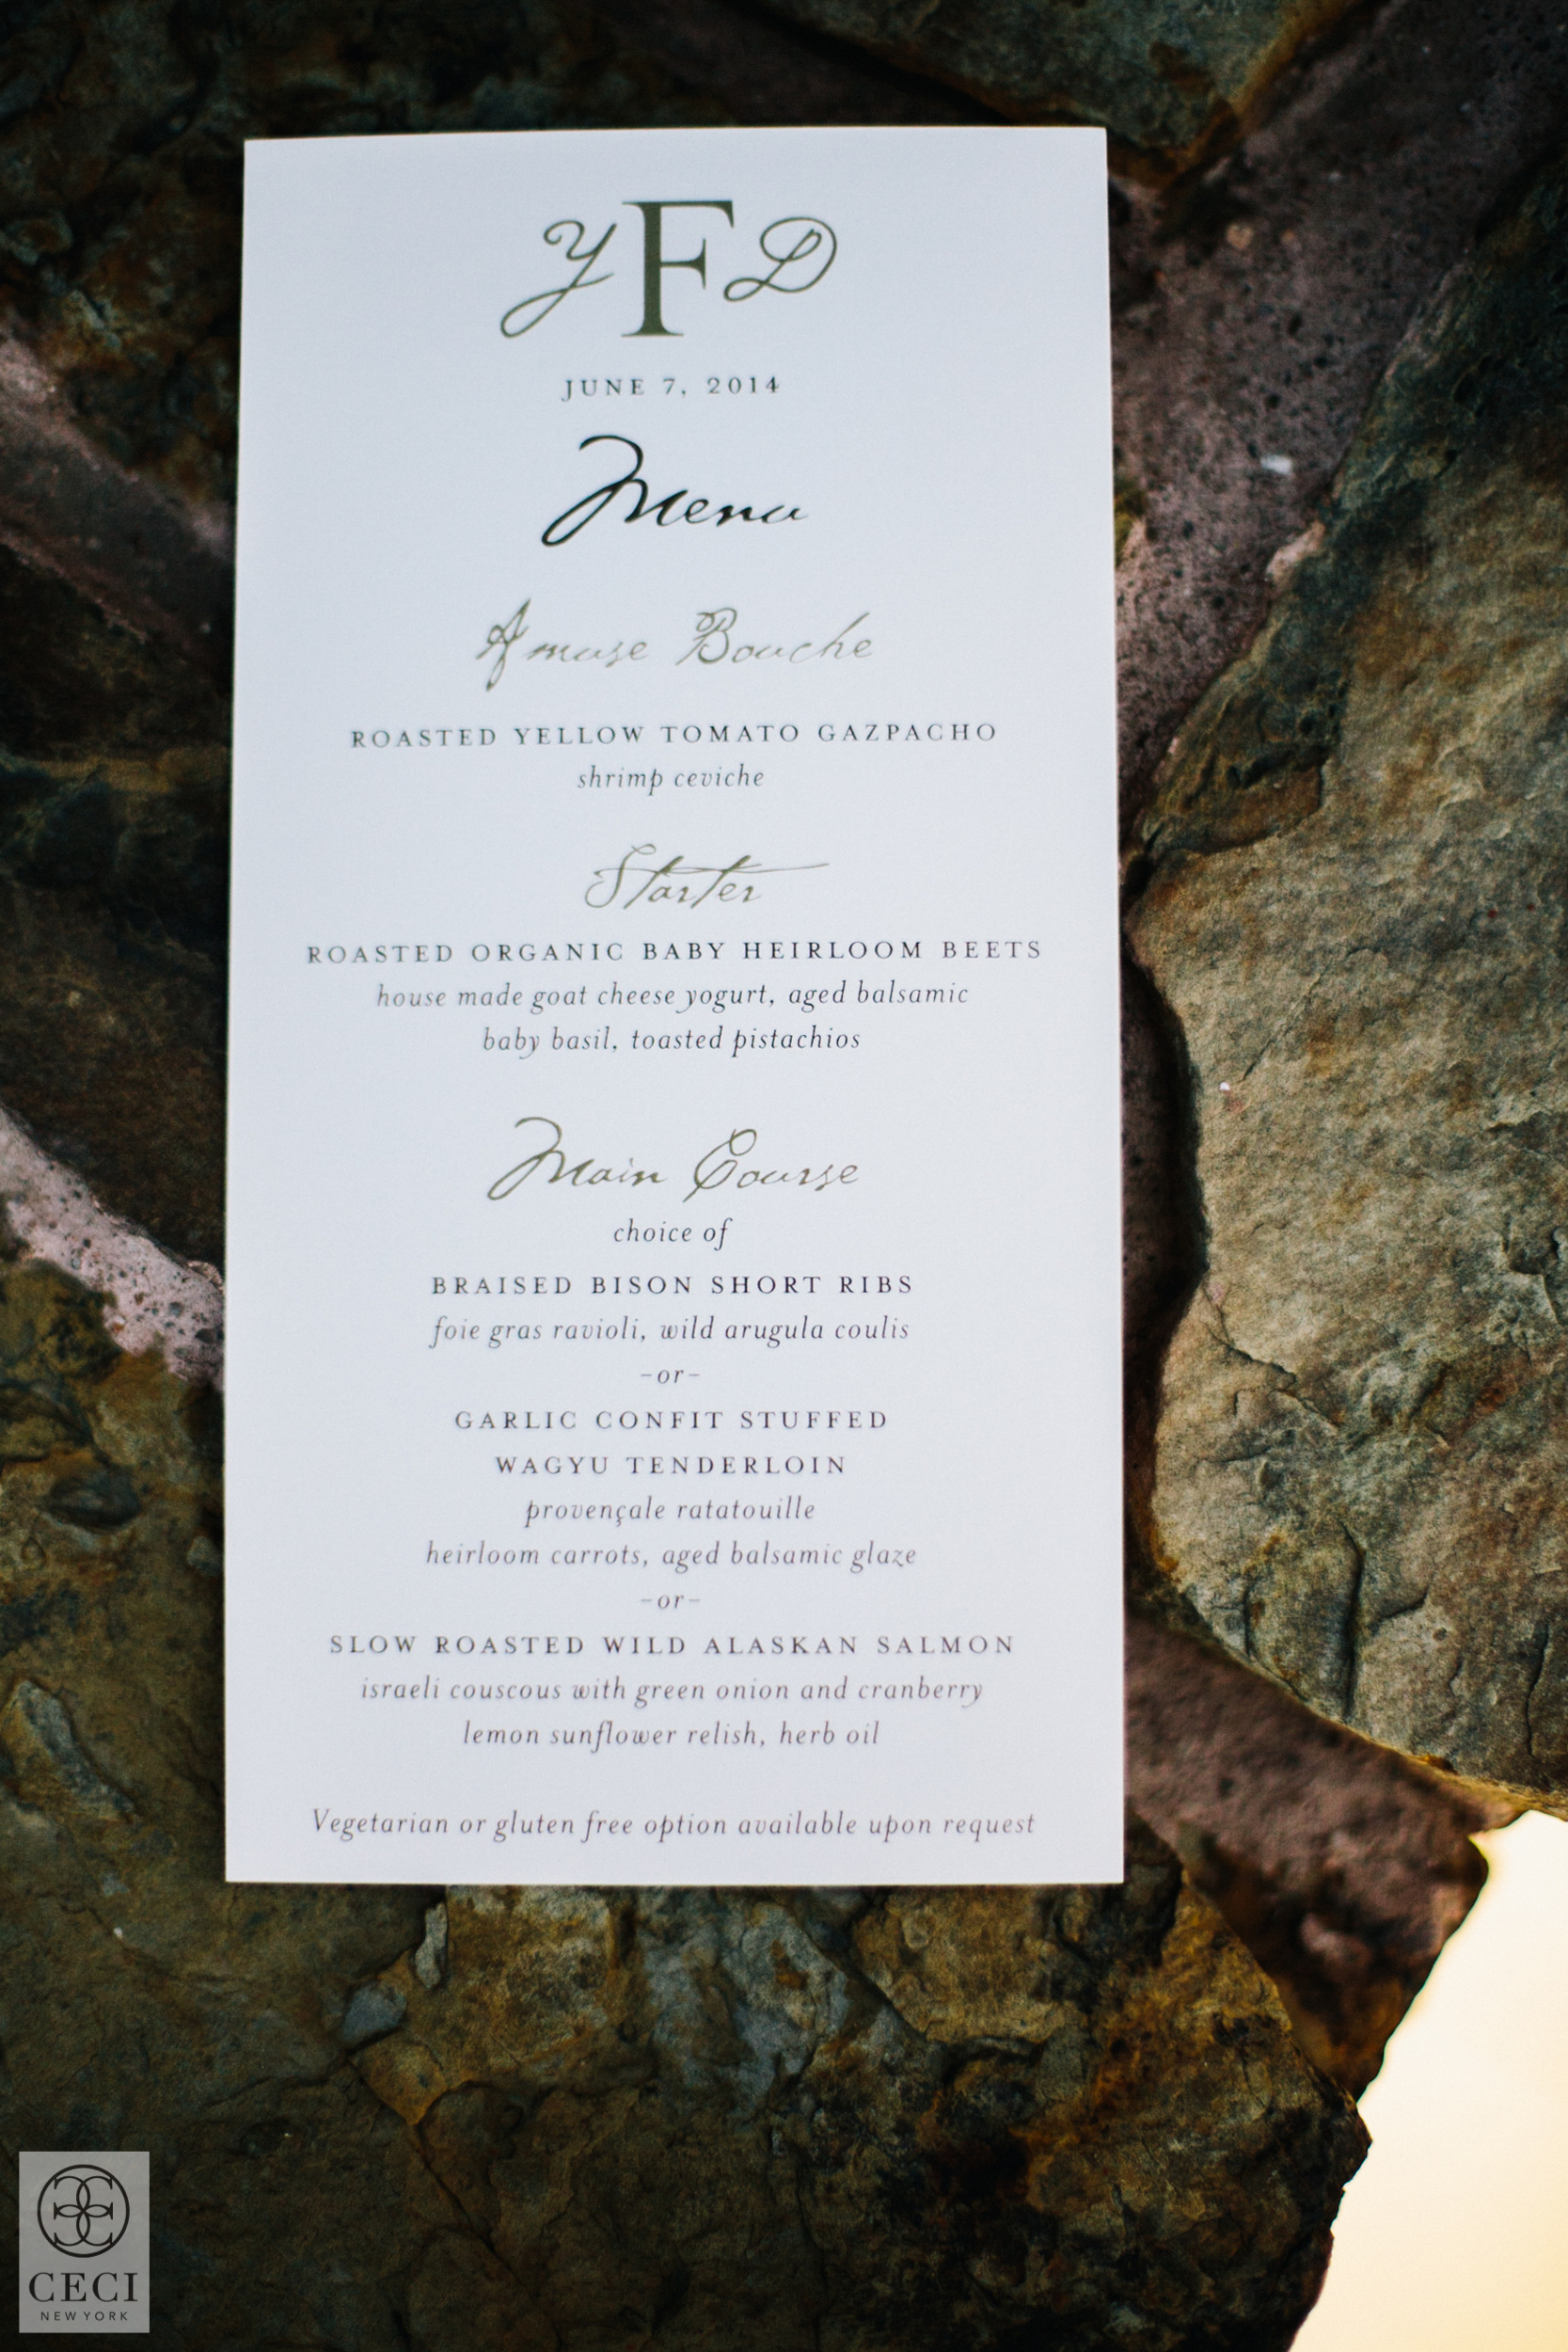 Ceci_New_York_Lyndsey_Hamilton_Events_Invitations_Wedding_Amangani_Elegance_Gold_Foil_Letterpress_Classic_Stamping_Custom_Couture_Personalized-6.jpg